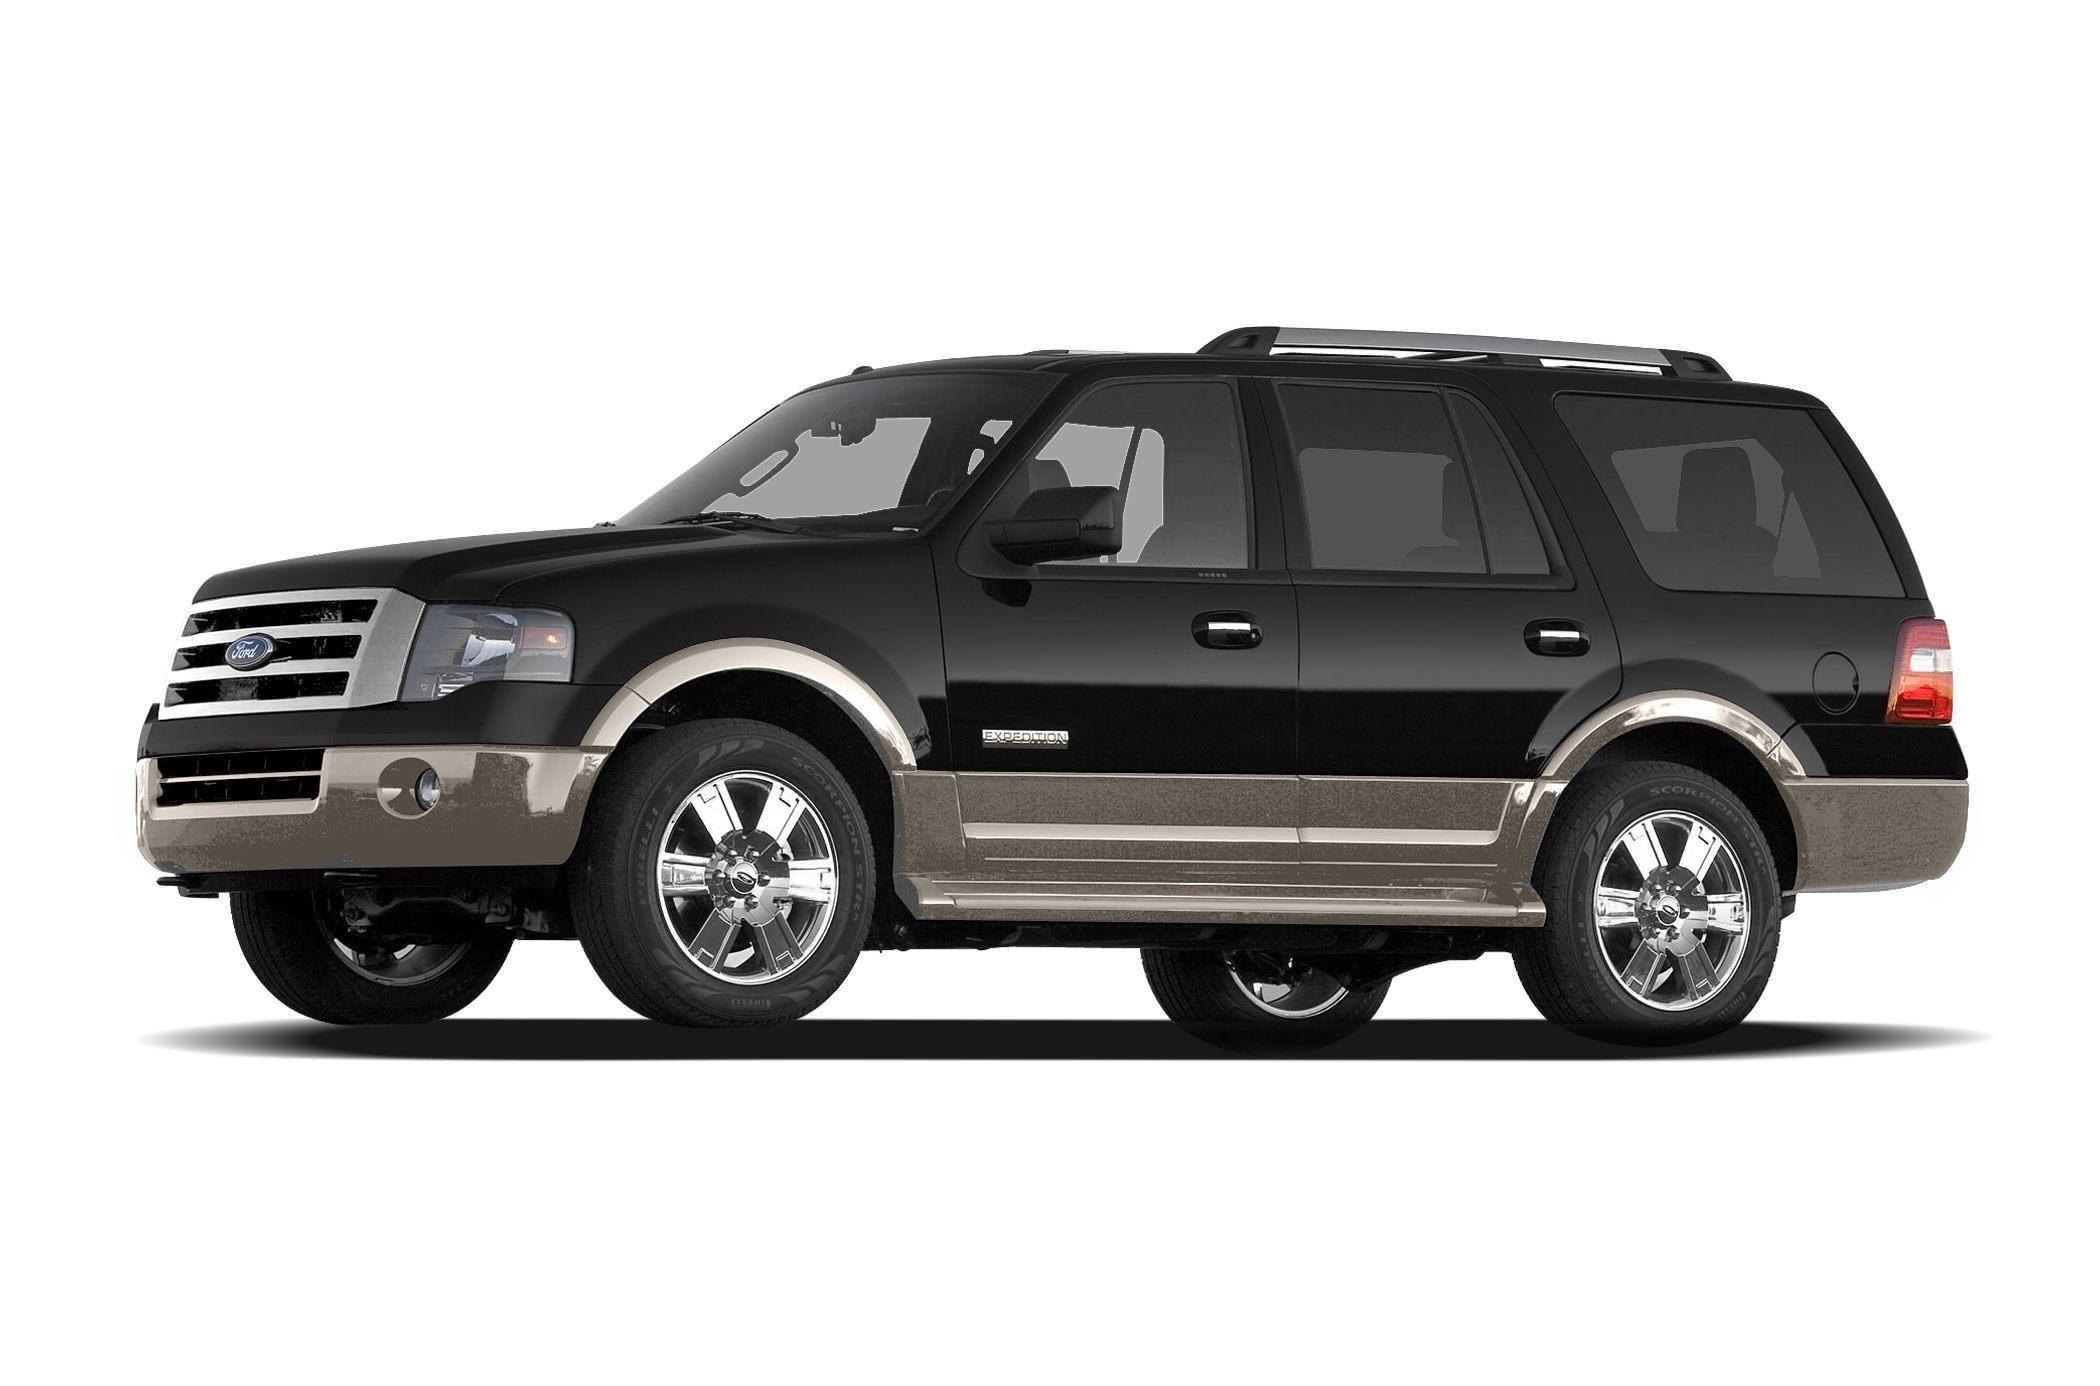 2008 Ford Expedition  Miles 135351Color Black Stock 4741P VIN 1FMFU17568LA27764